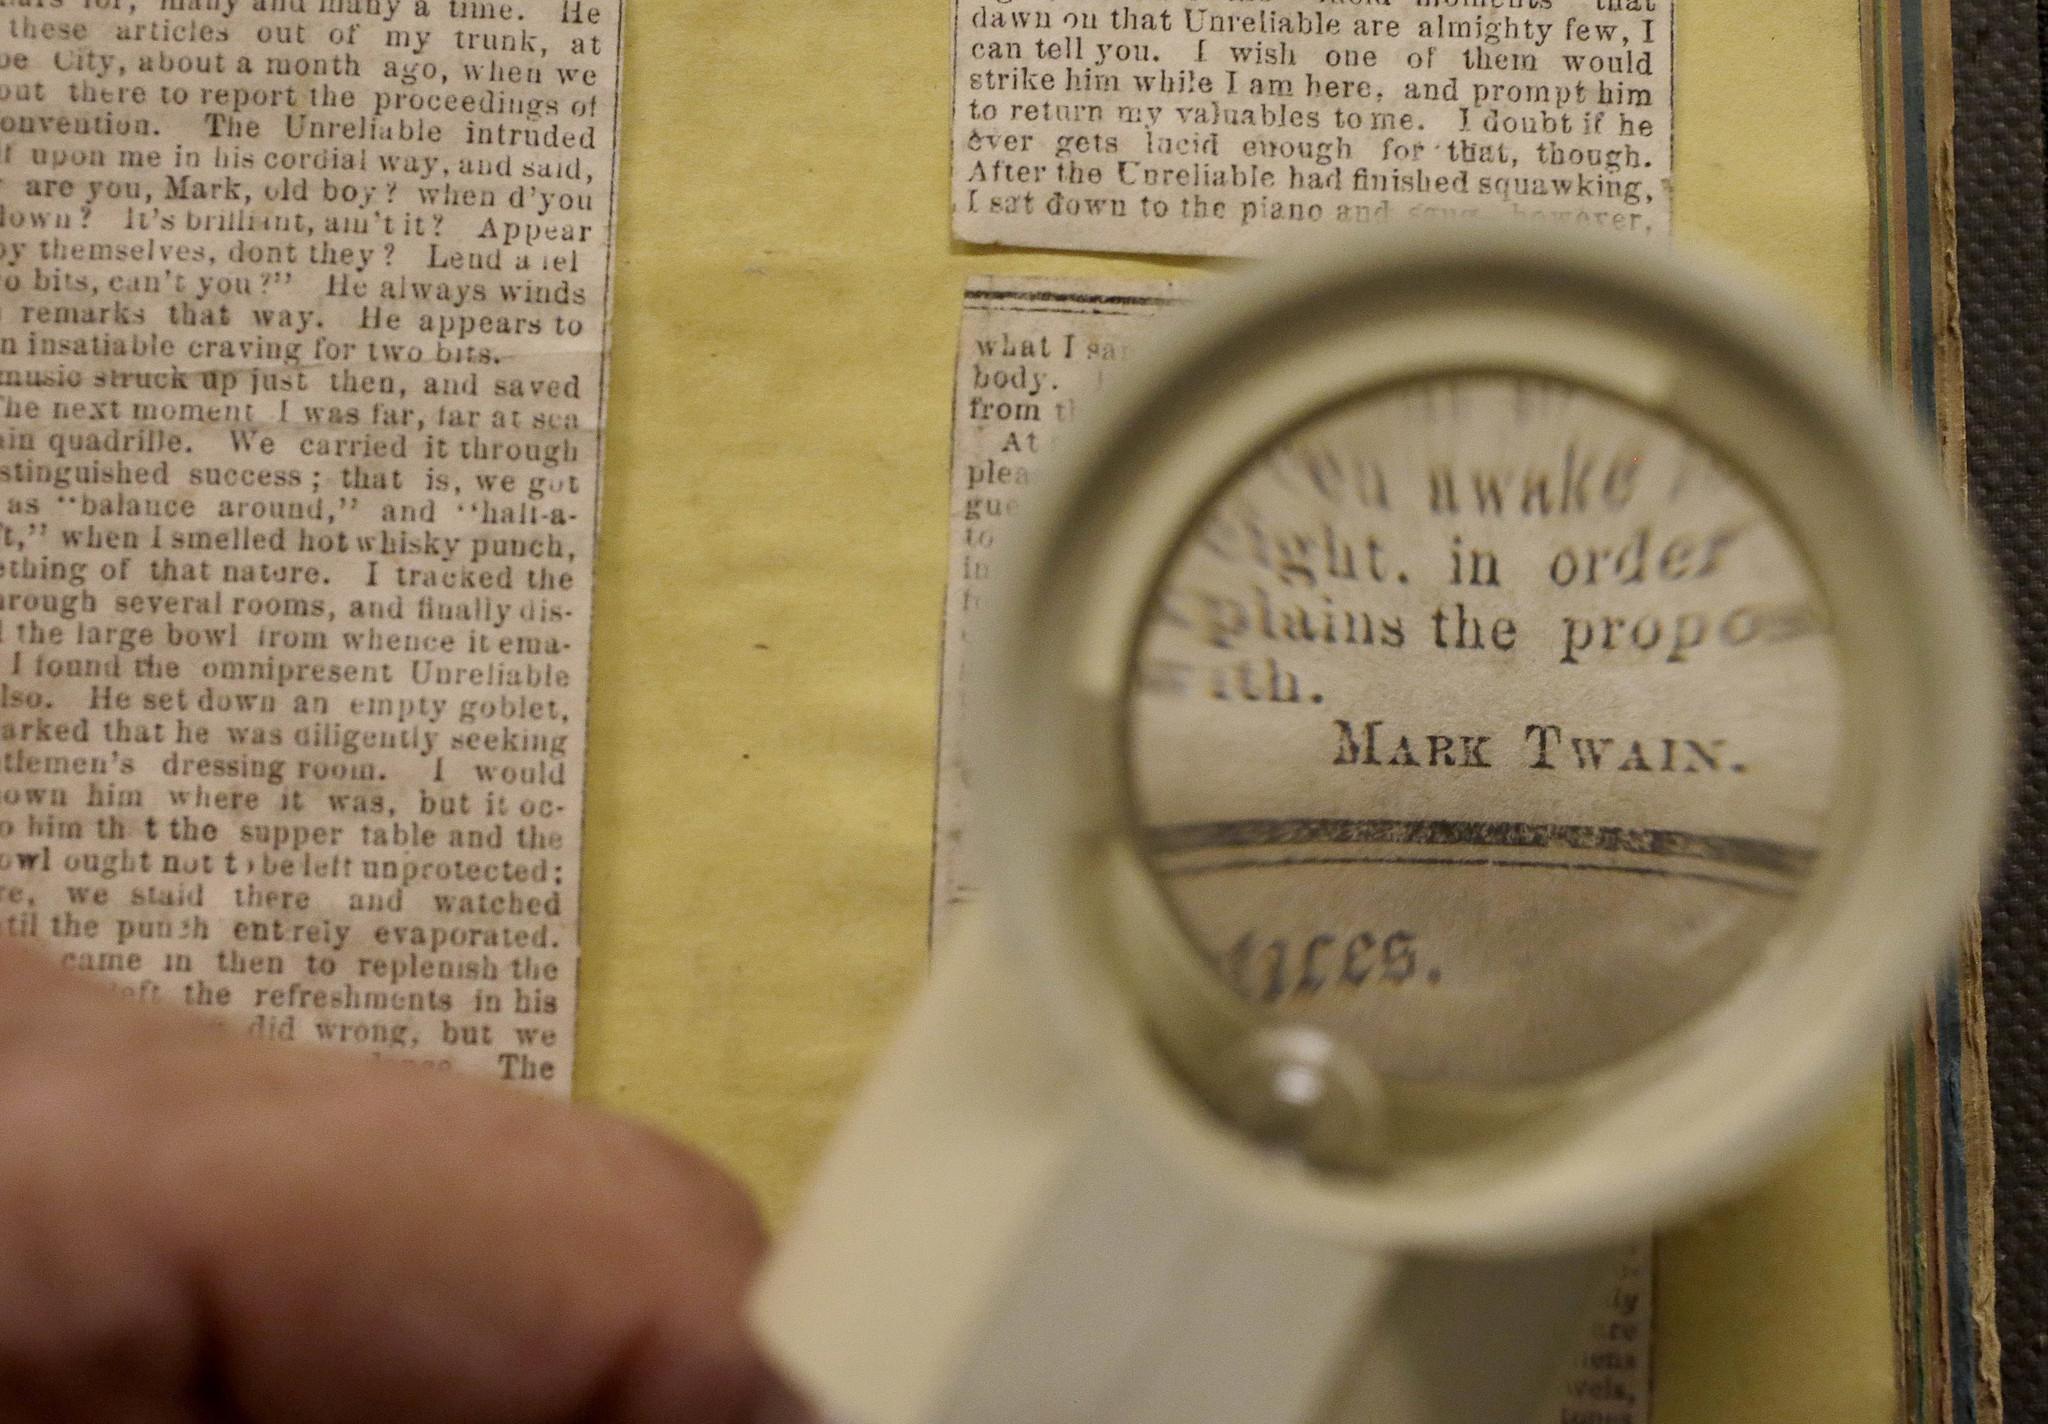 Lost Mark Twain newspaper stories recovered by UC Berkeley scholars